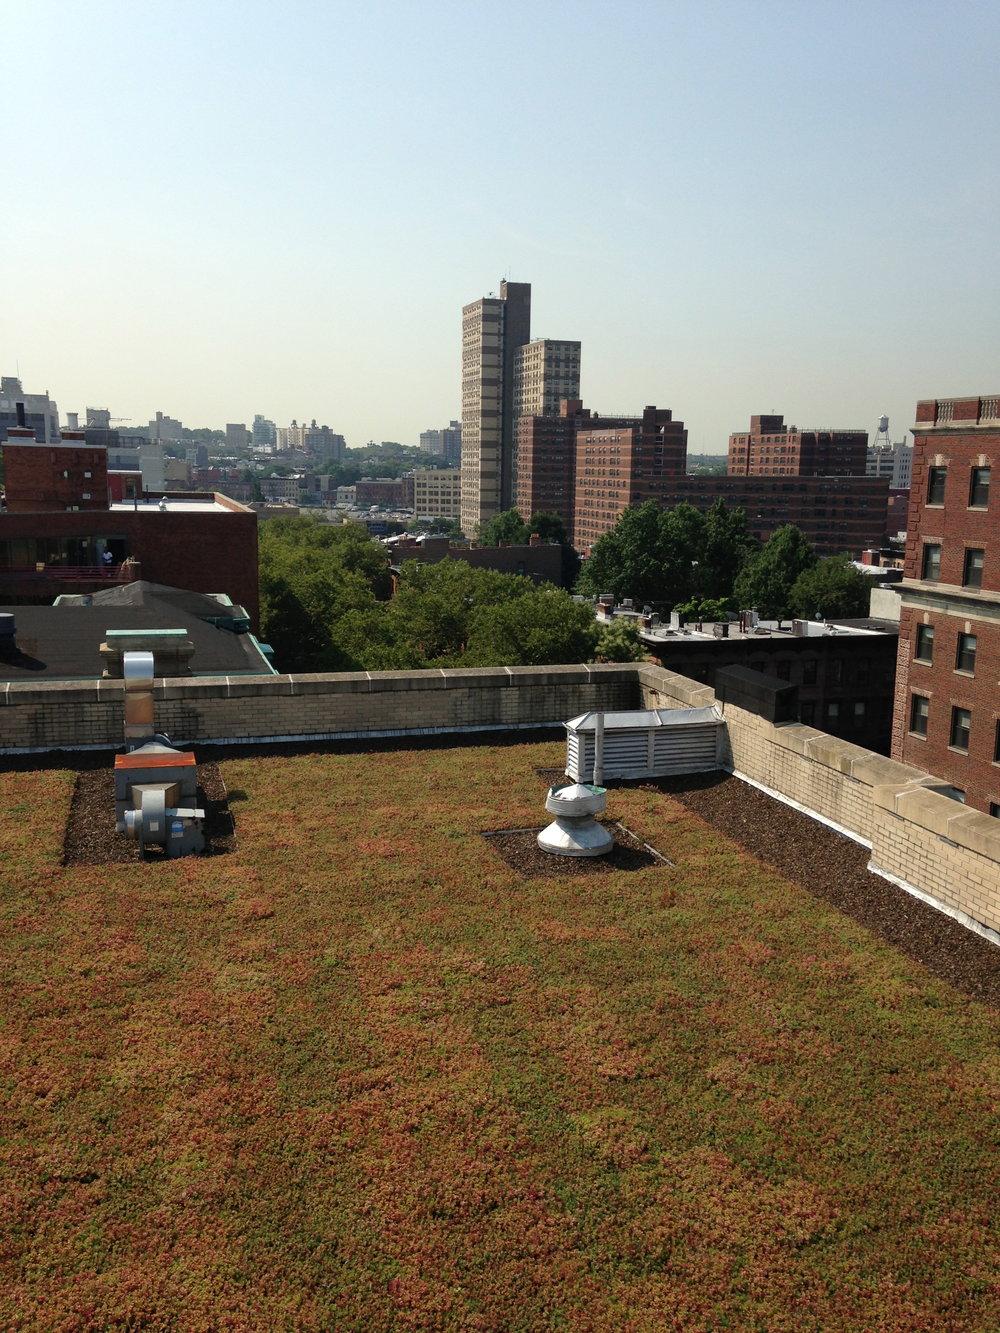 BL Sedum Green Roof